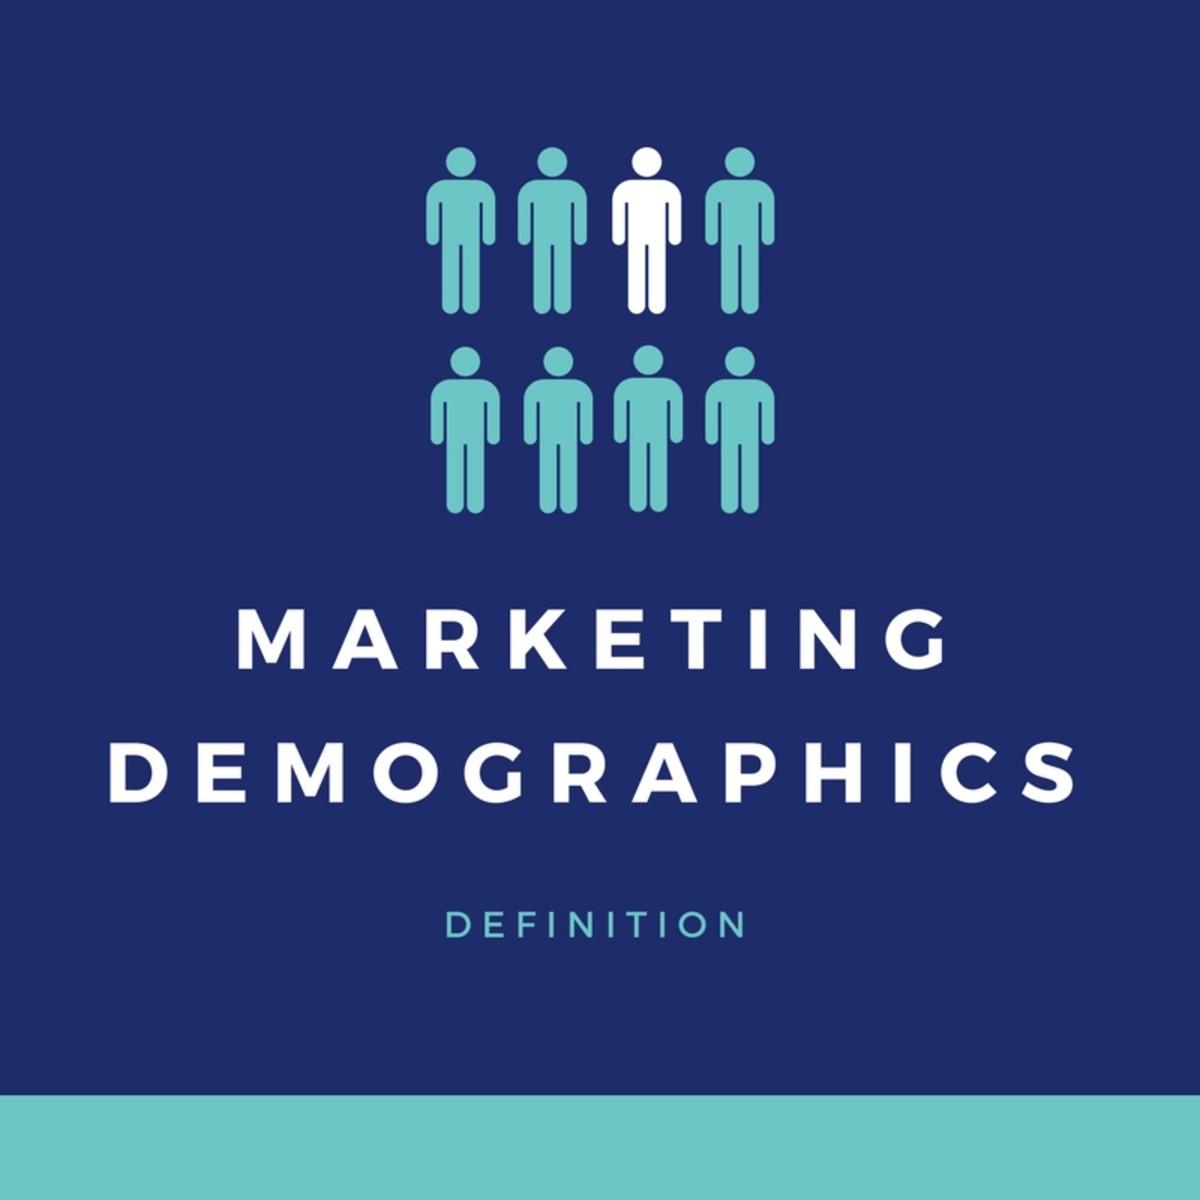 marketing-demographics-definition